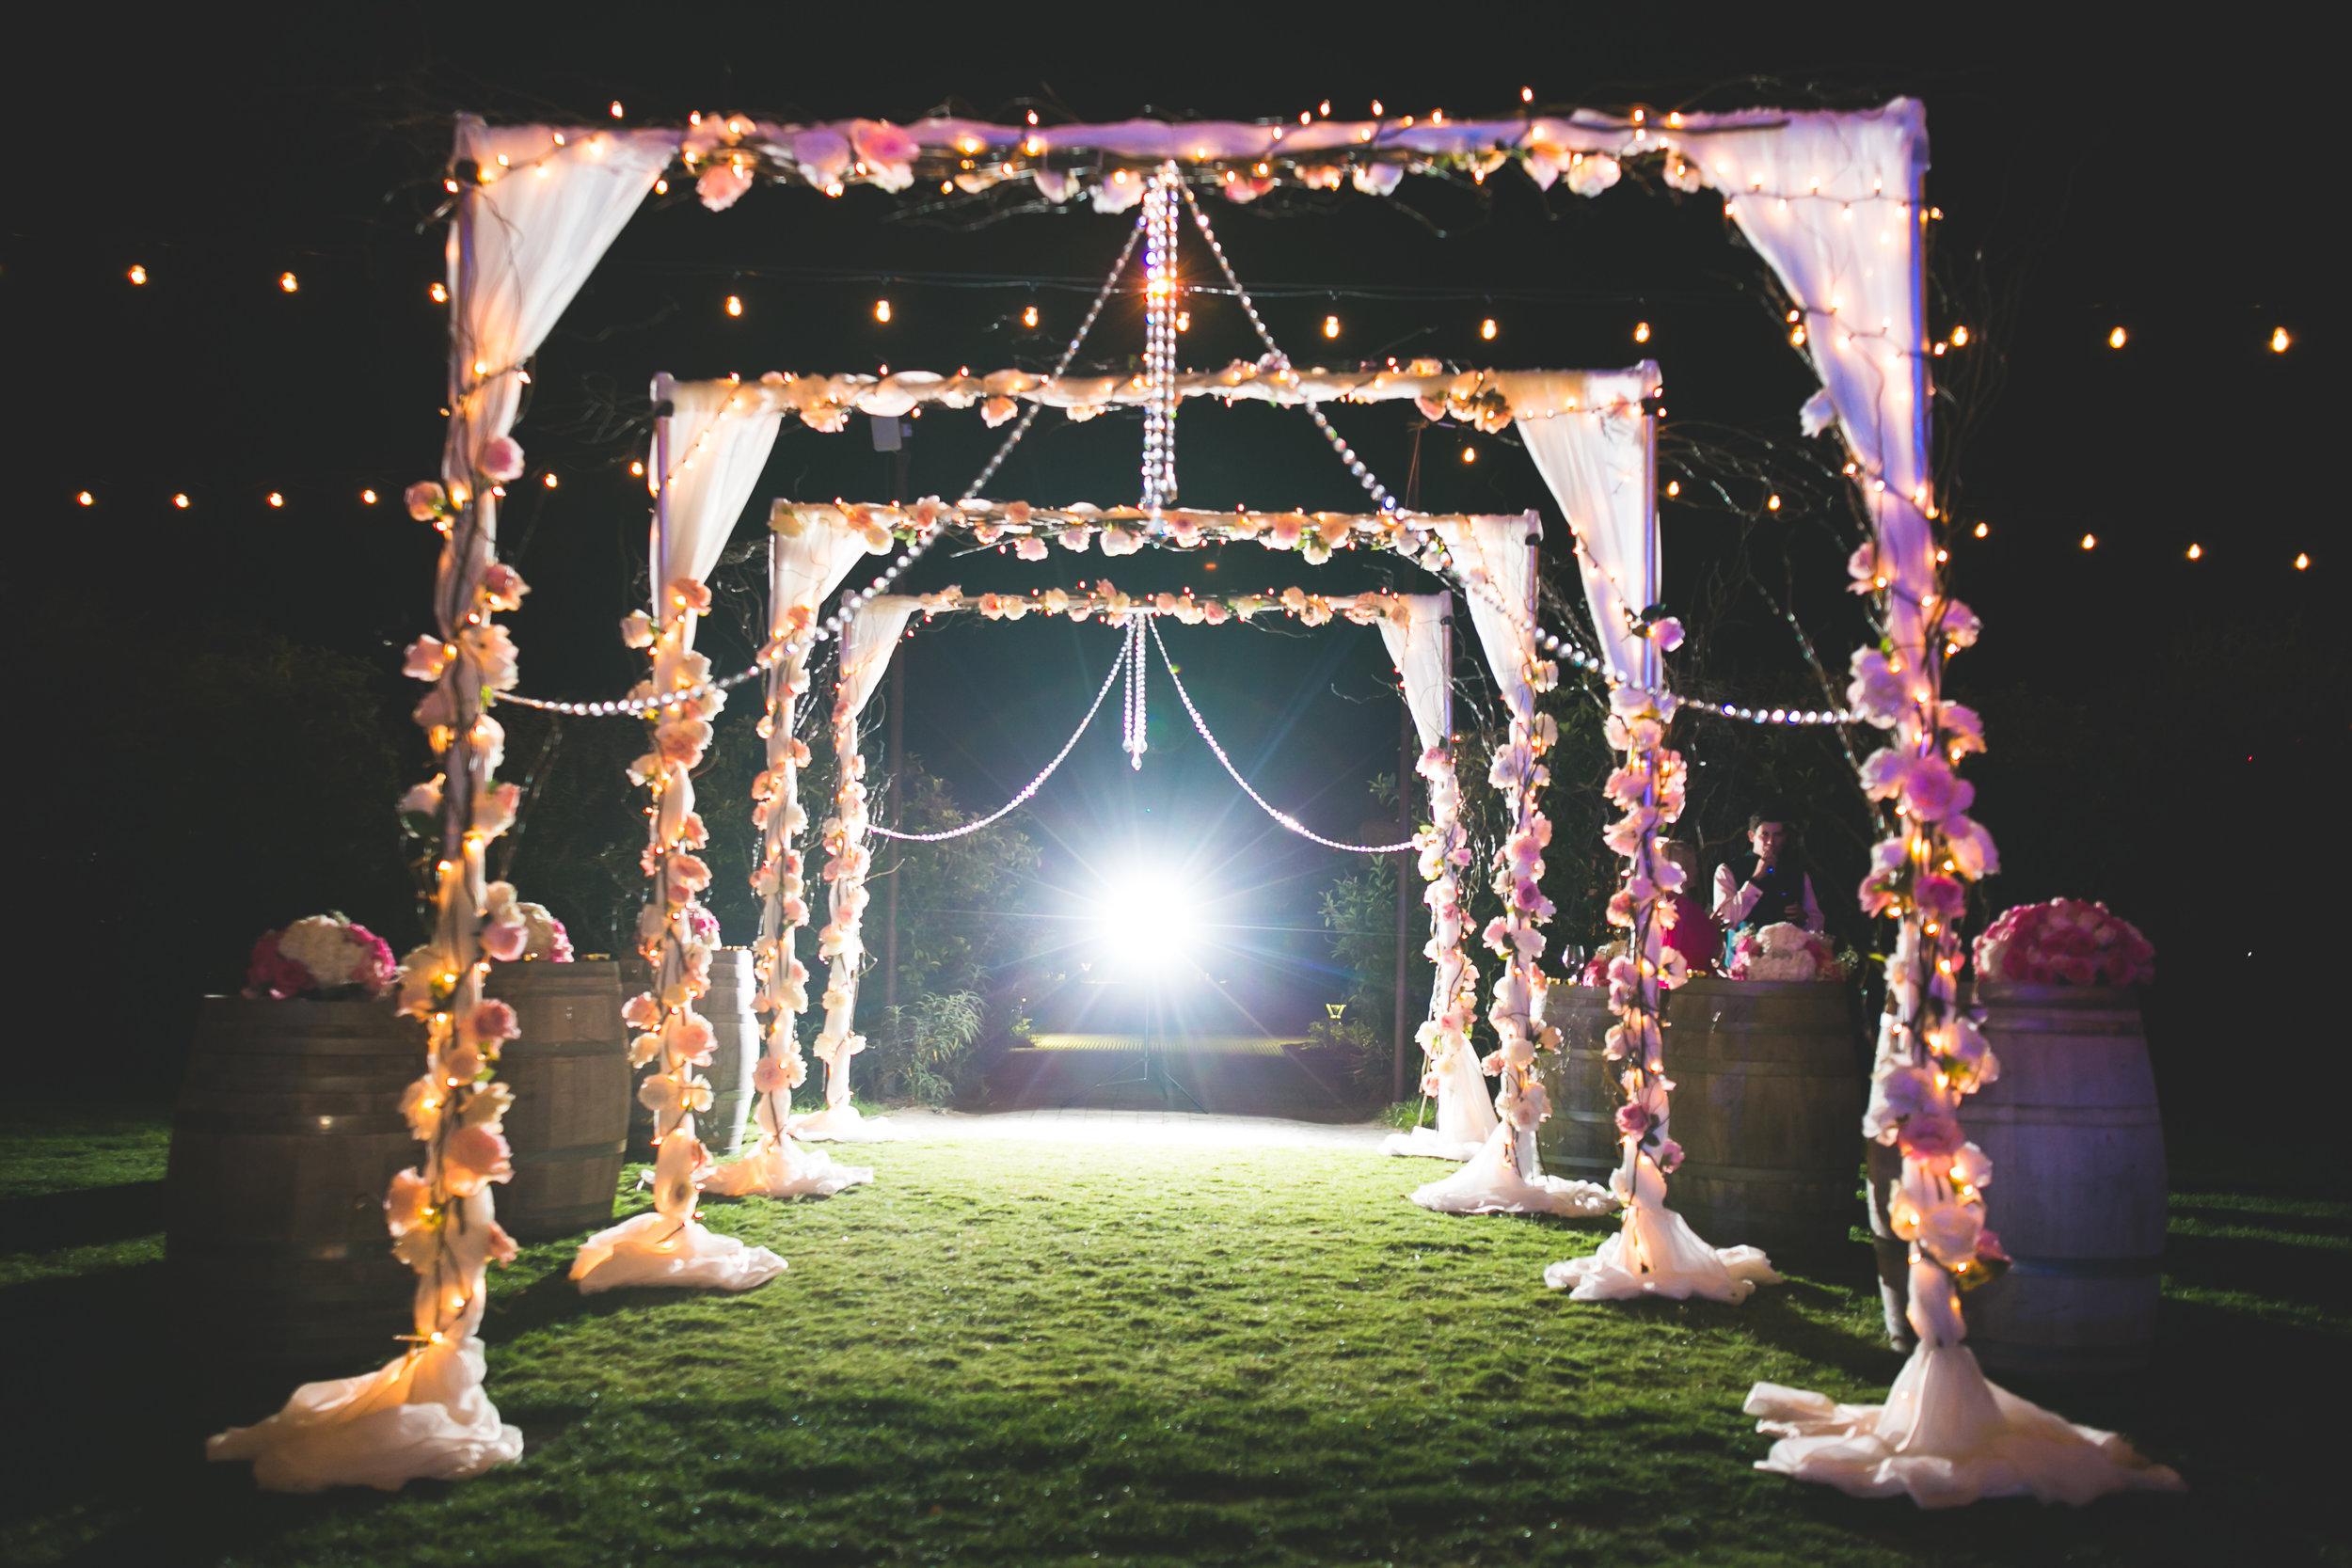 karina_asresh_wedding-1021.jpg